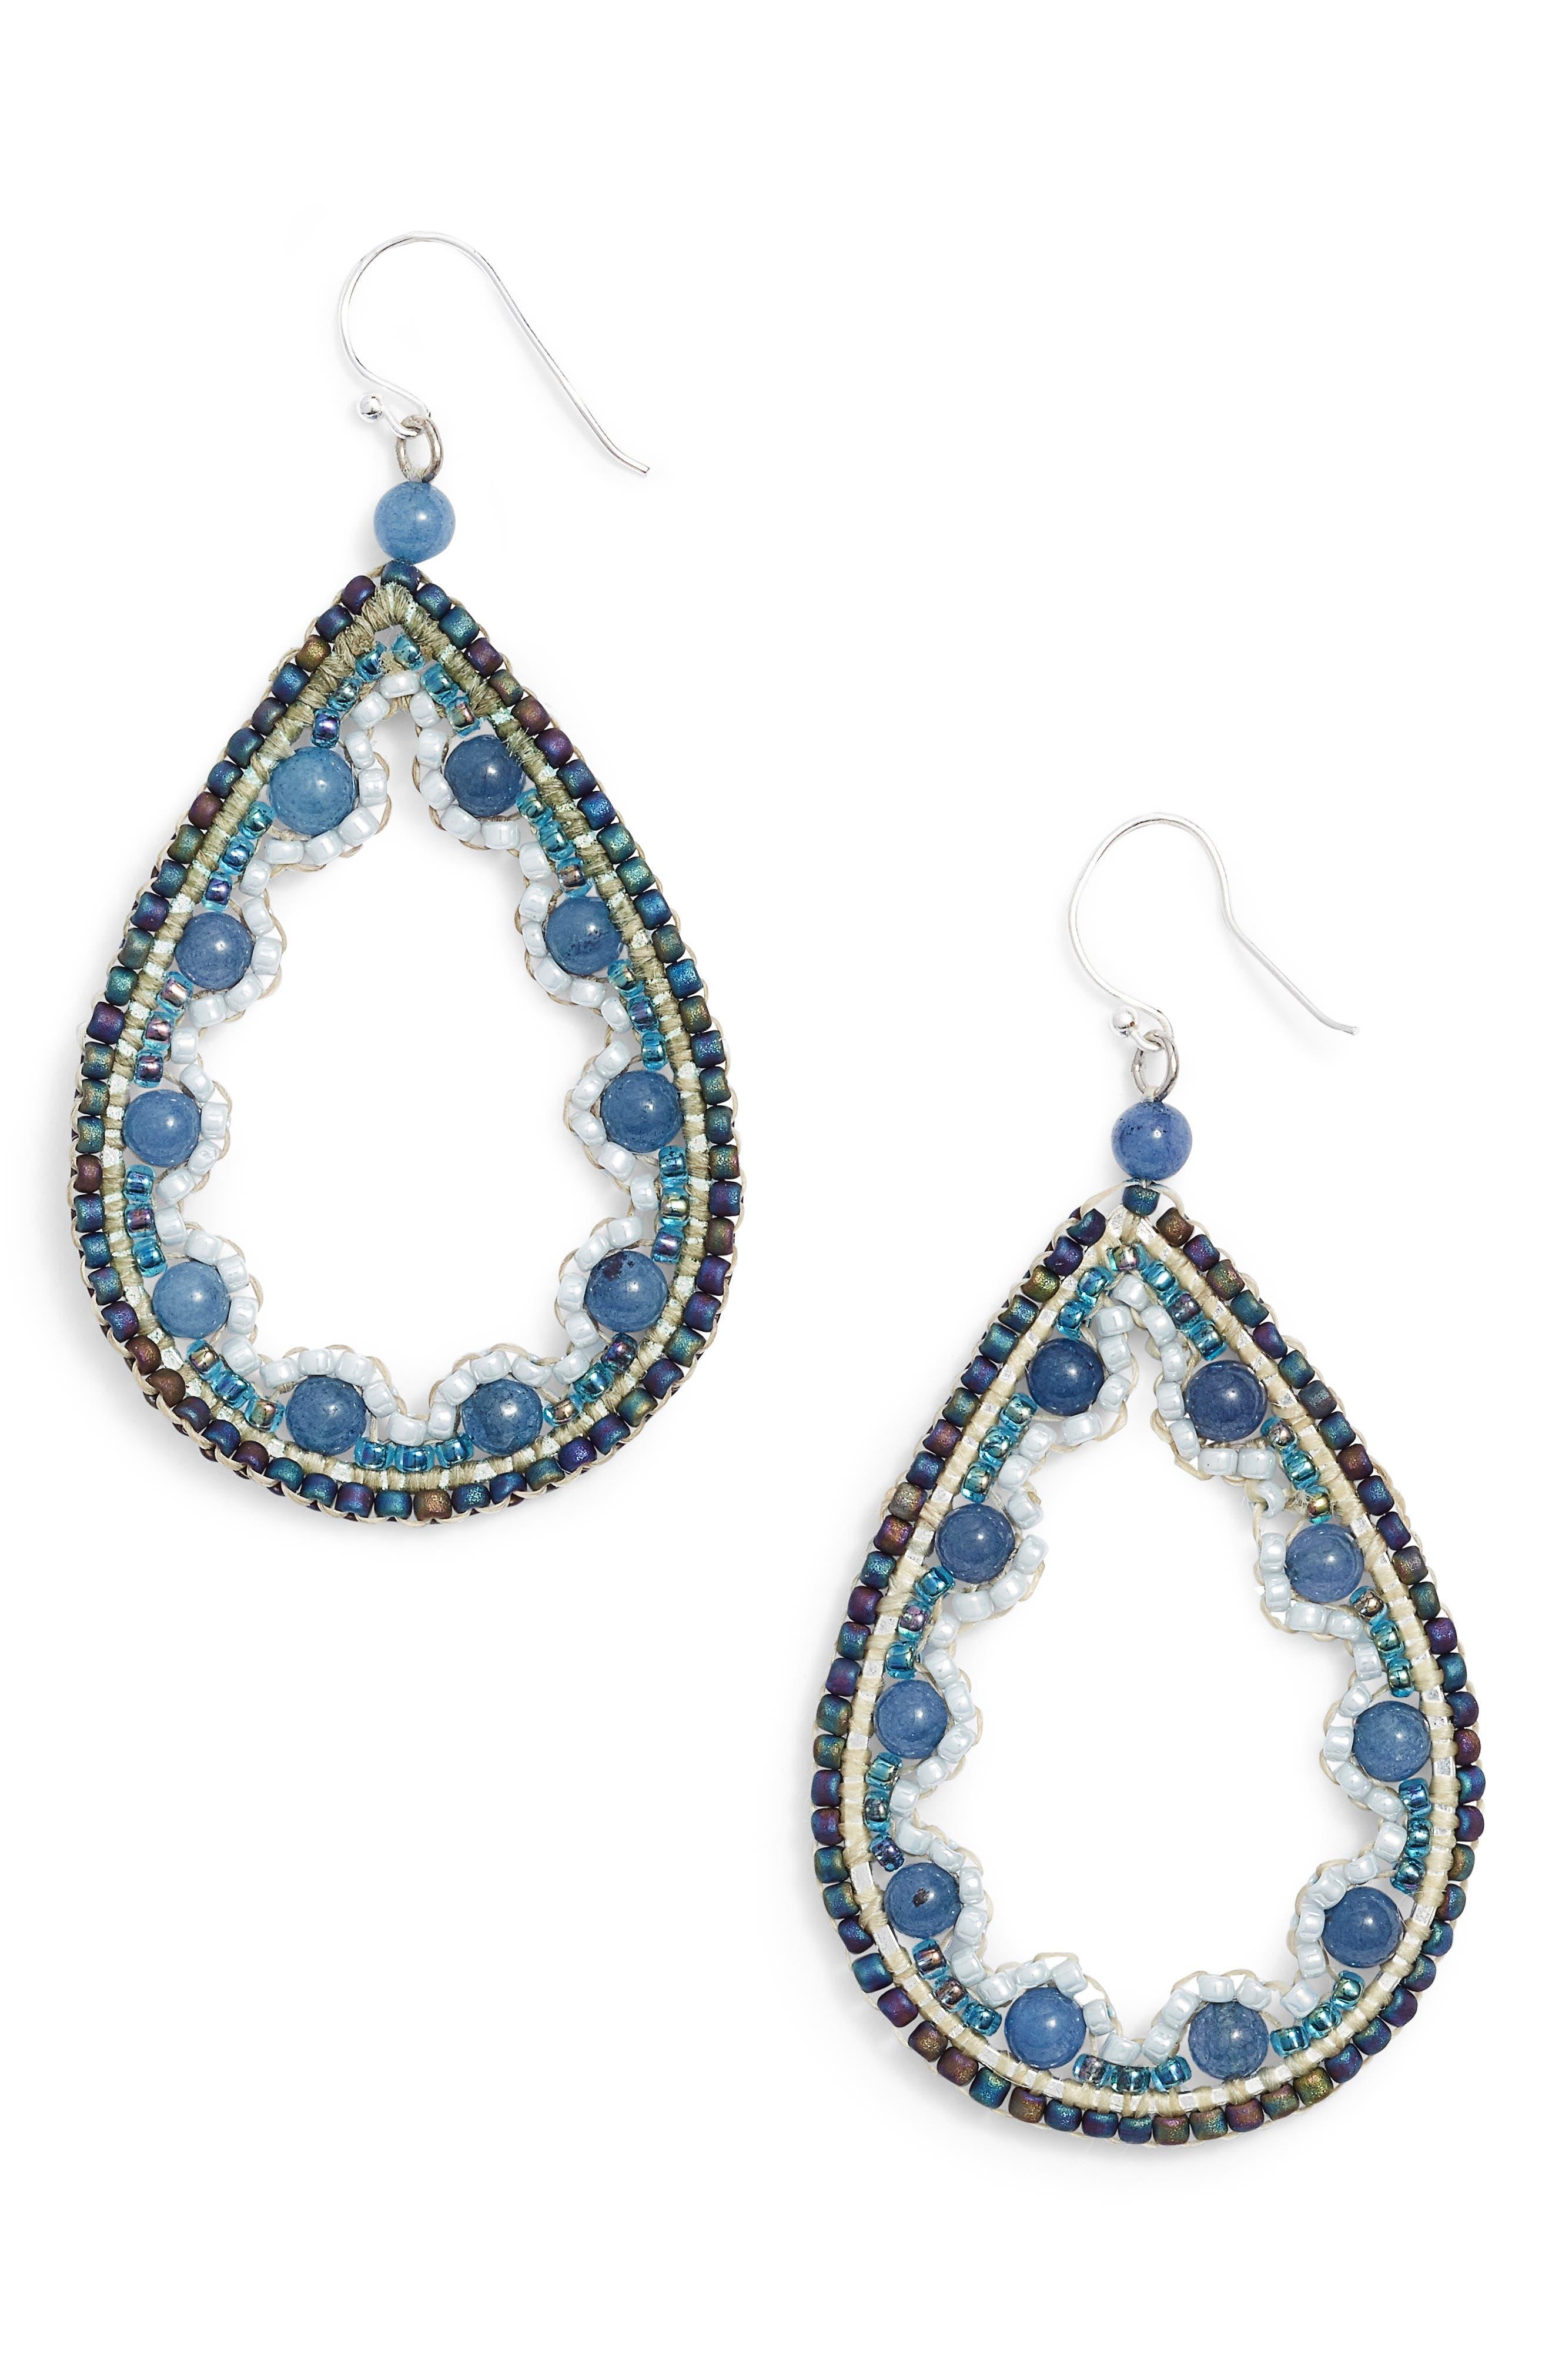 Beaded Agate Teardrop Earrings,                         Main,                         color, Blue